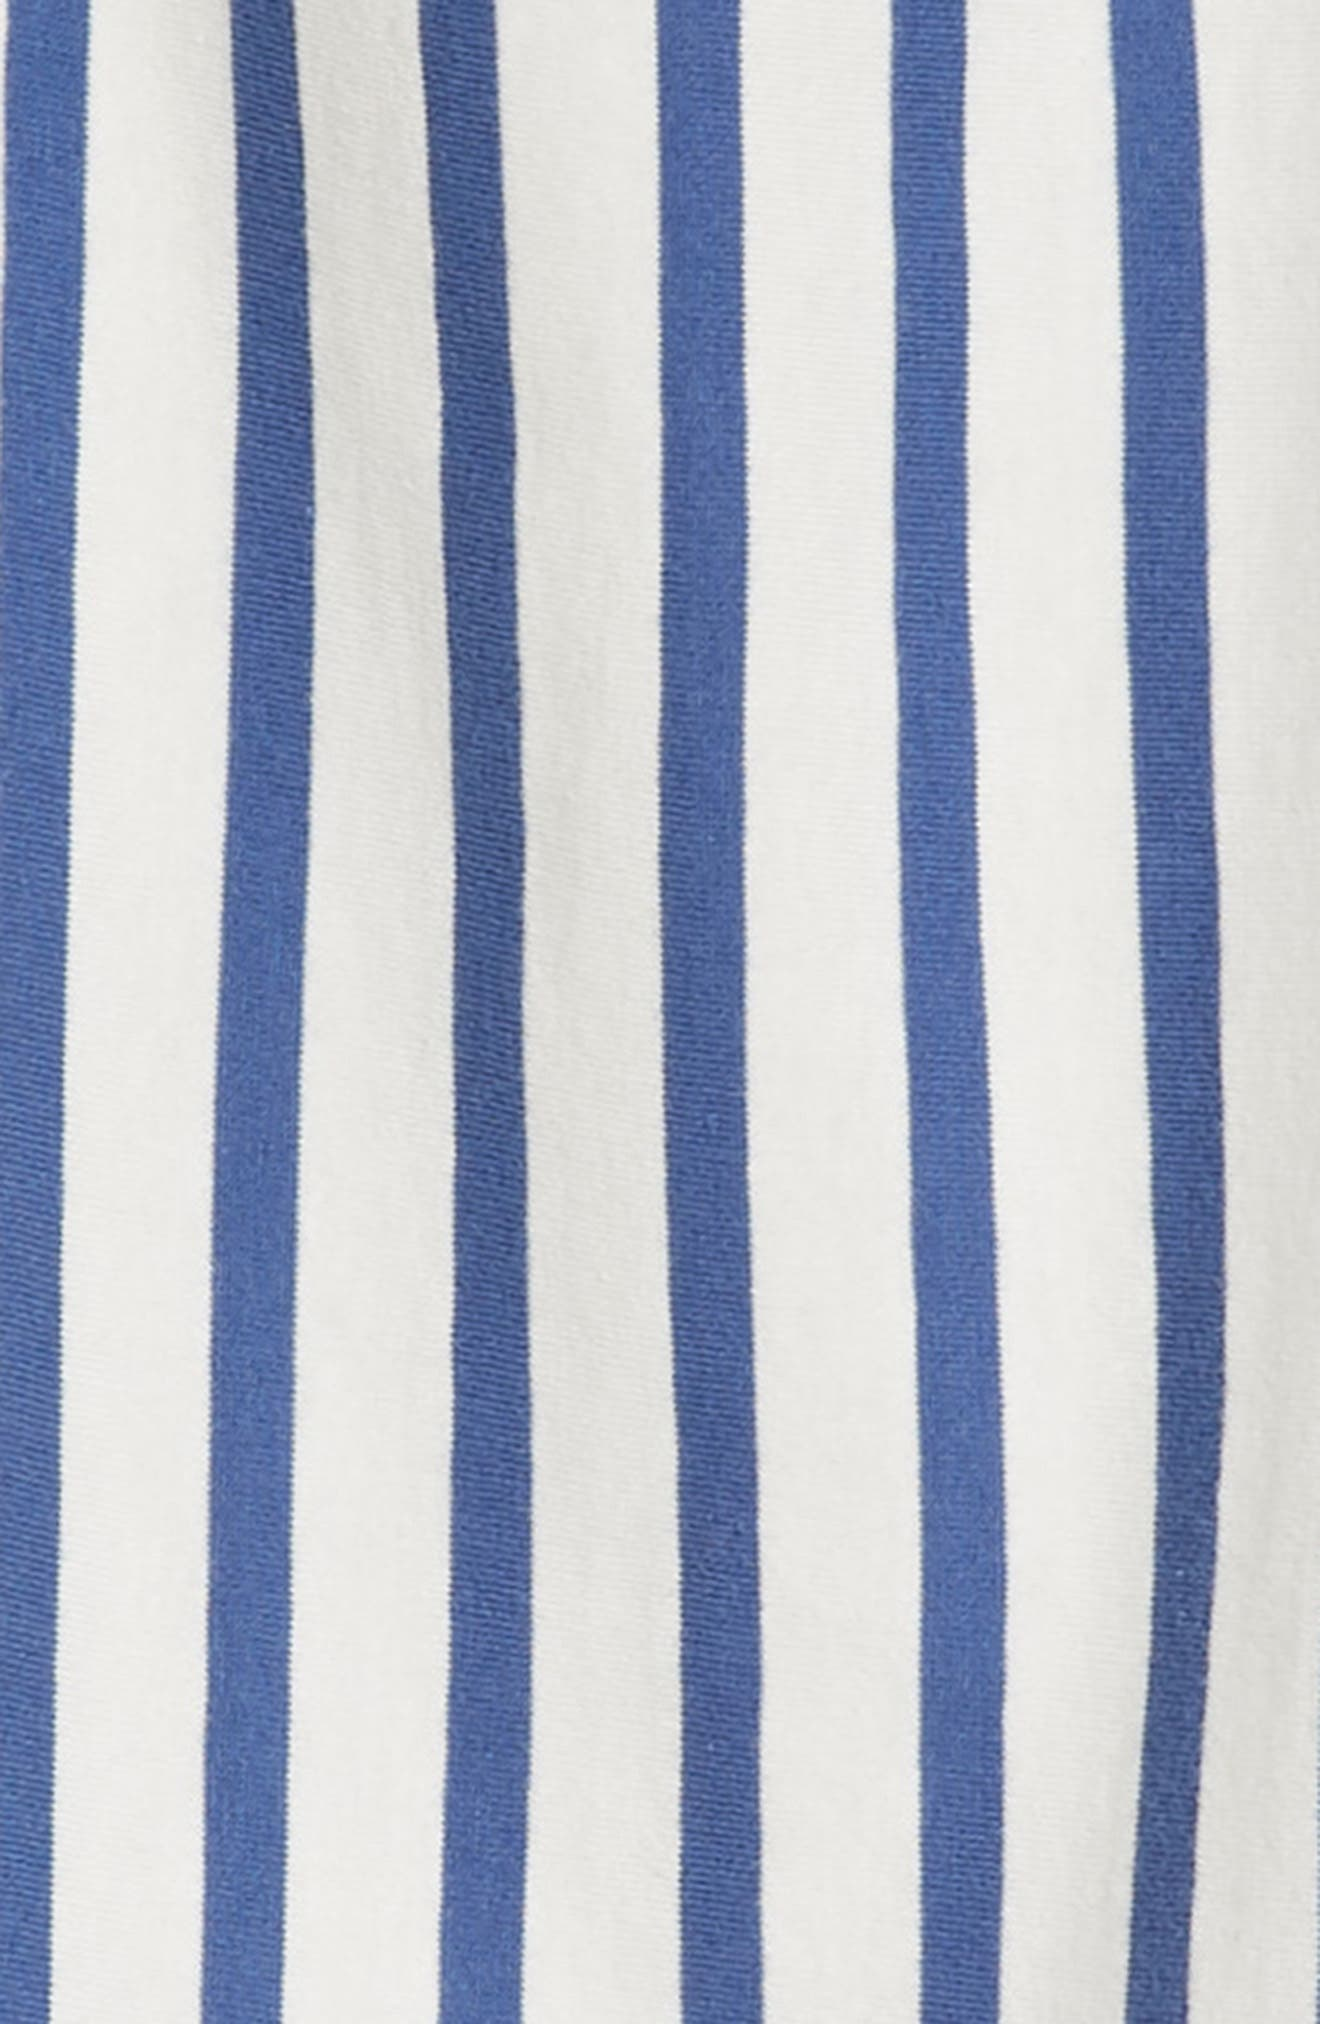 Stripe Trapeze Dress,                             Alternate thumbnail 3, color,                             415